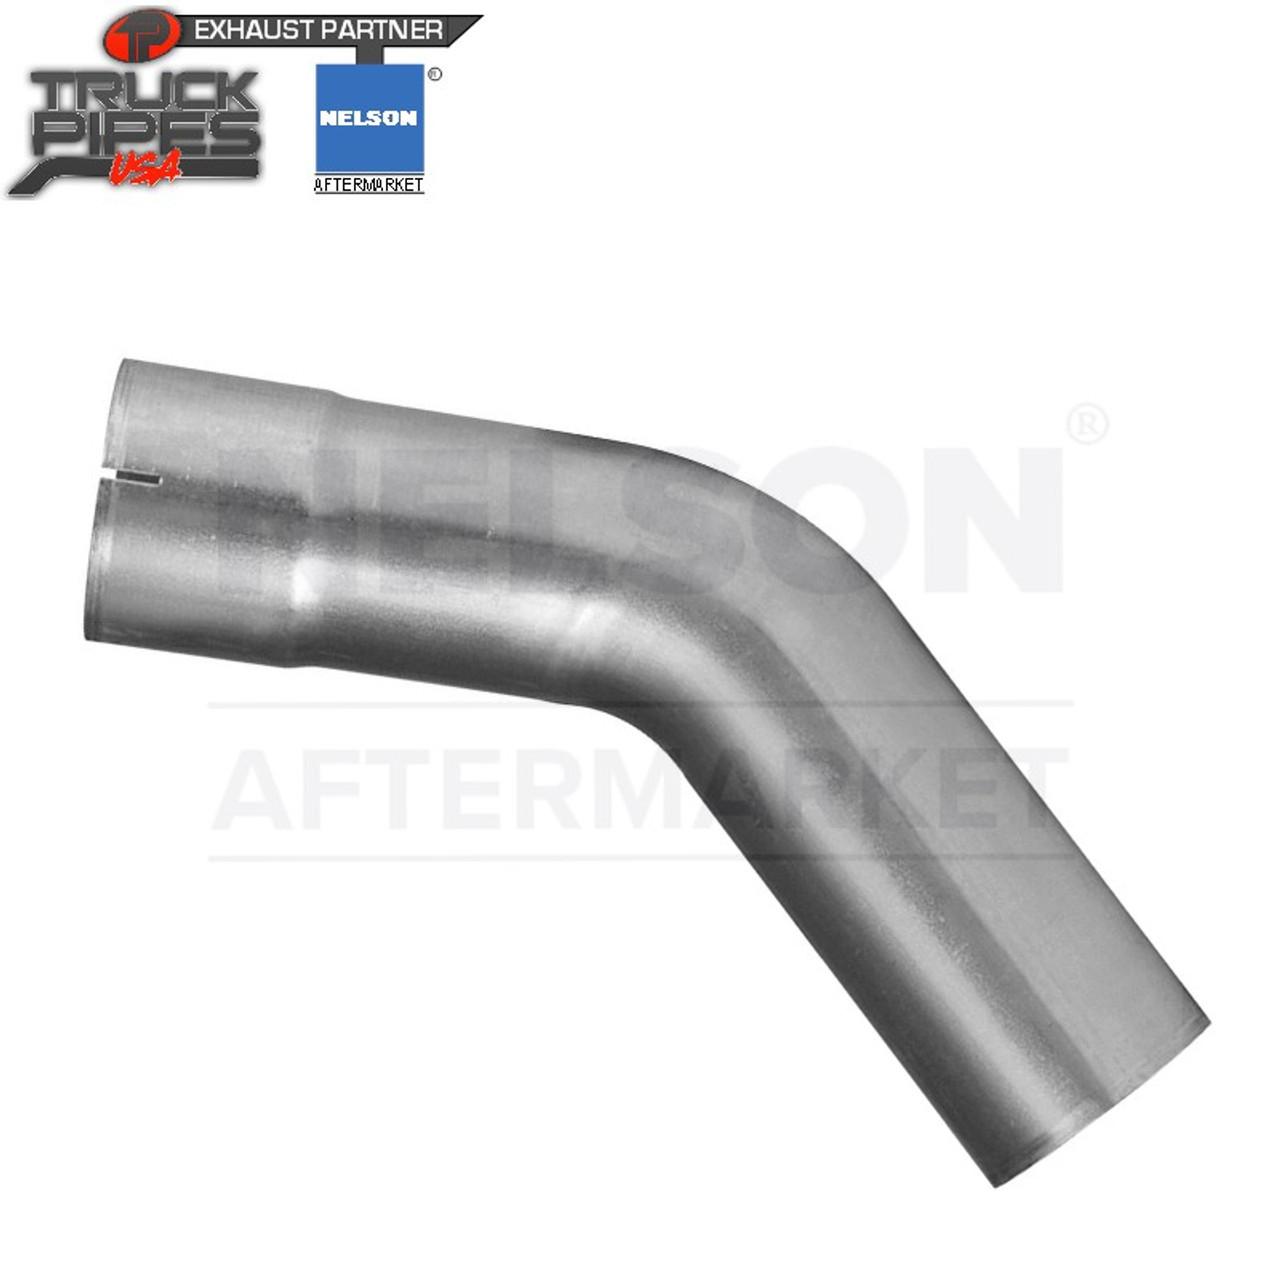 "6"" OD-ID 45 Degree Exhaust Elbow Aluminized x 18"" Leg Length Nelson 89076A"